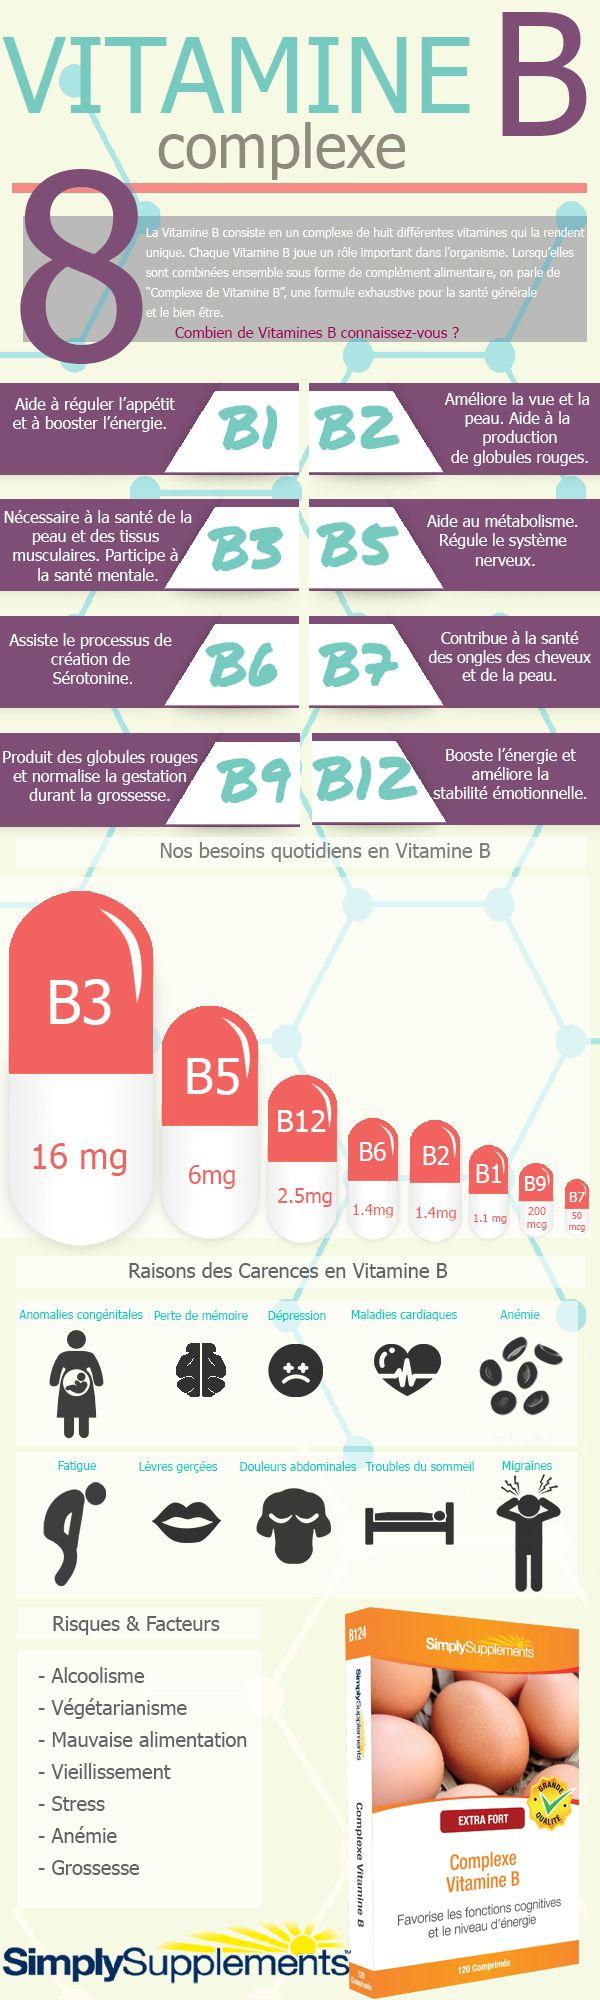 #Vitamine B : Infographie explicative.